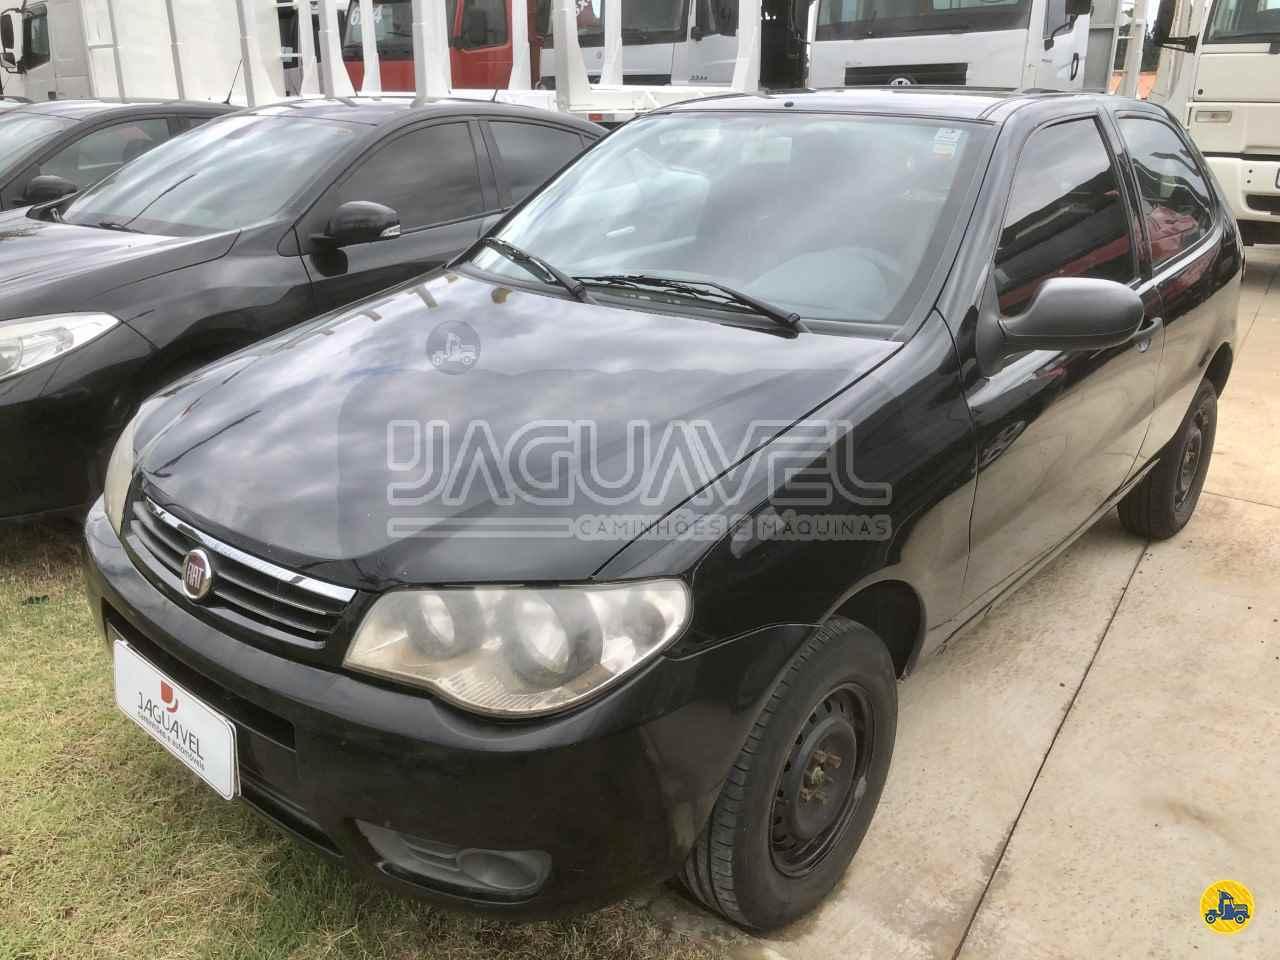 CARRO FIAT Palio 1.0 ELX Jaguavel Caminhões JAGUARIAIVA PARANÁ PR